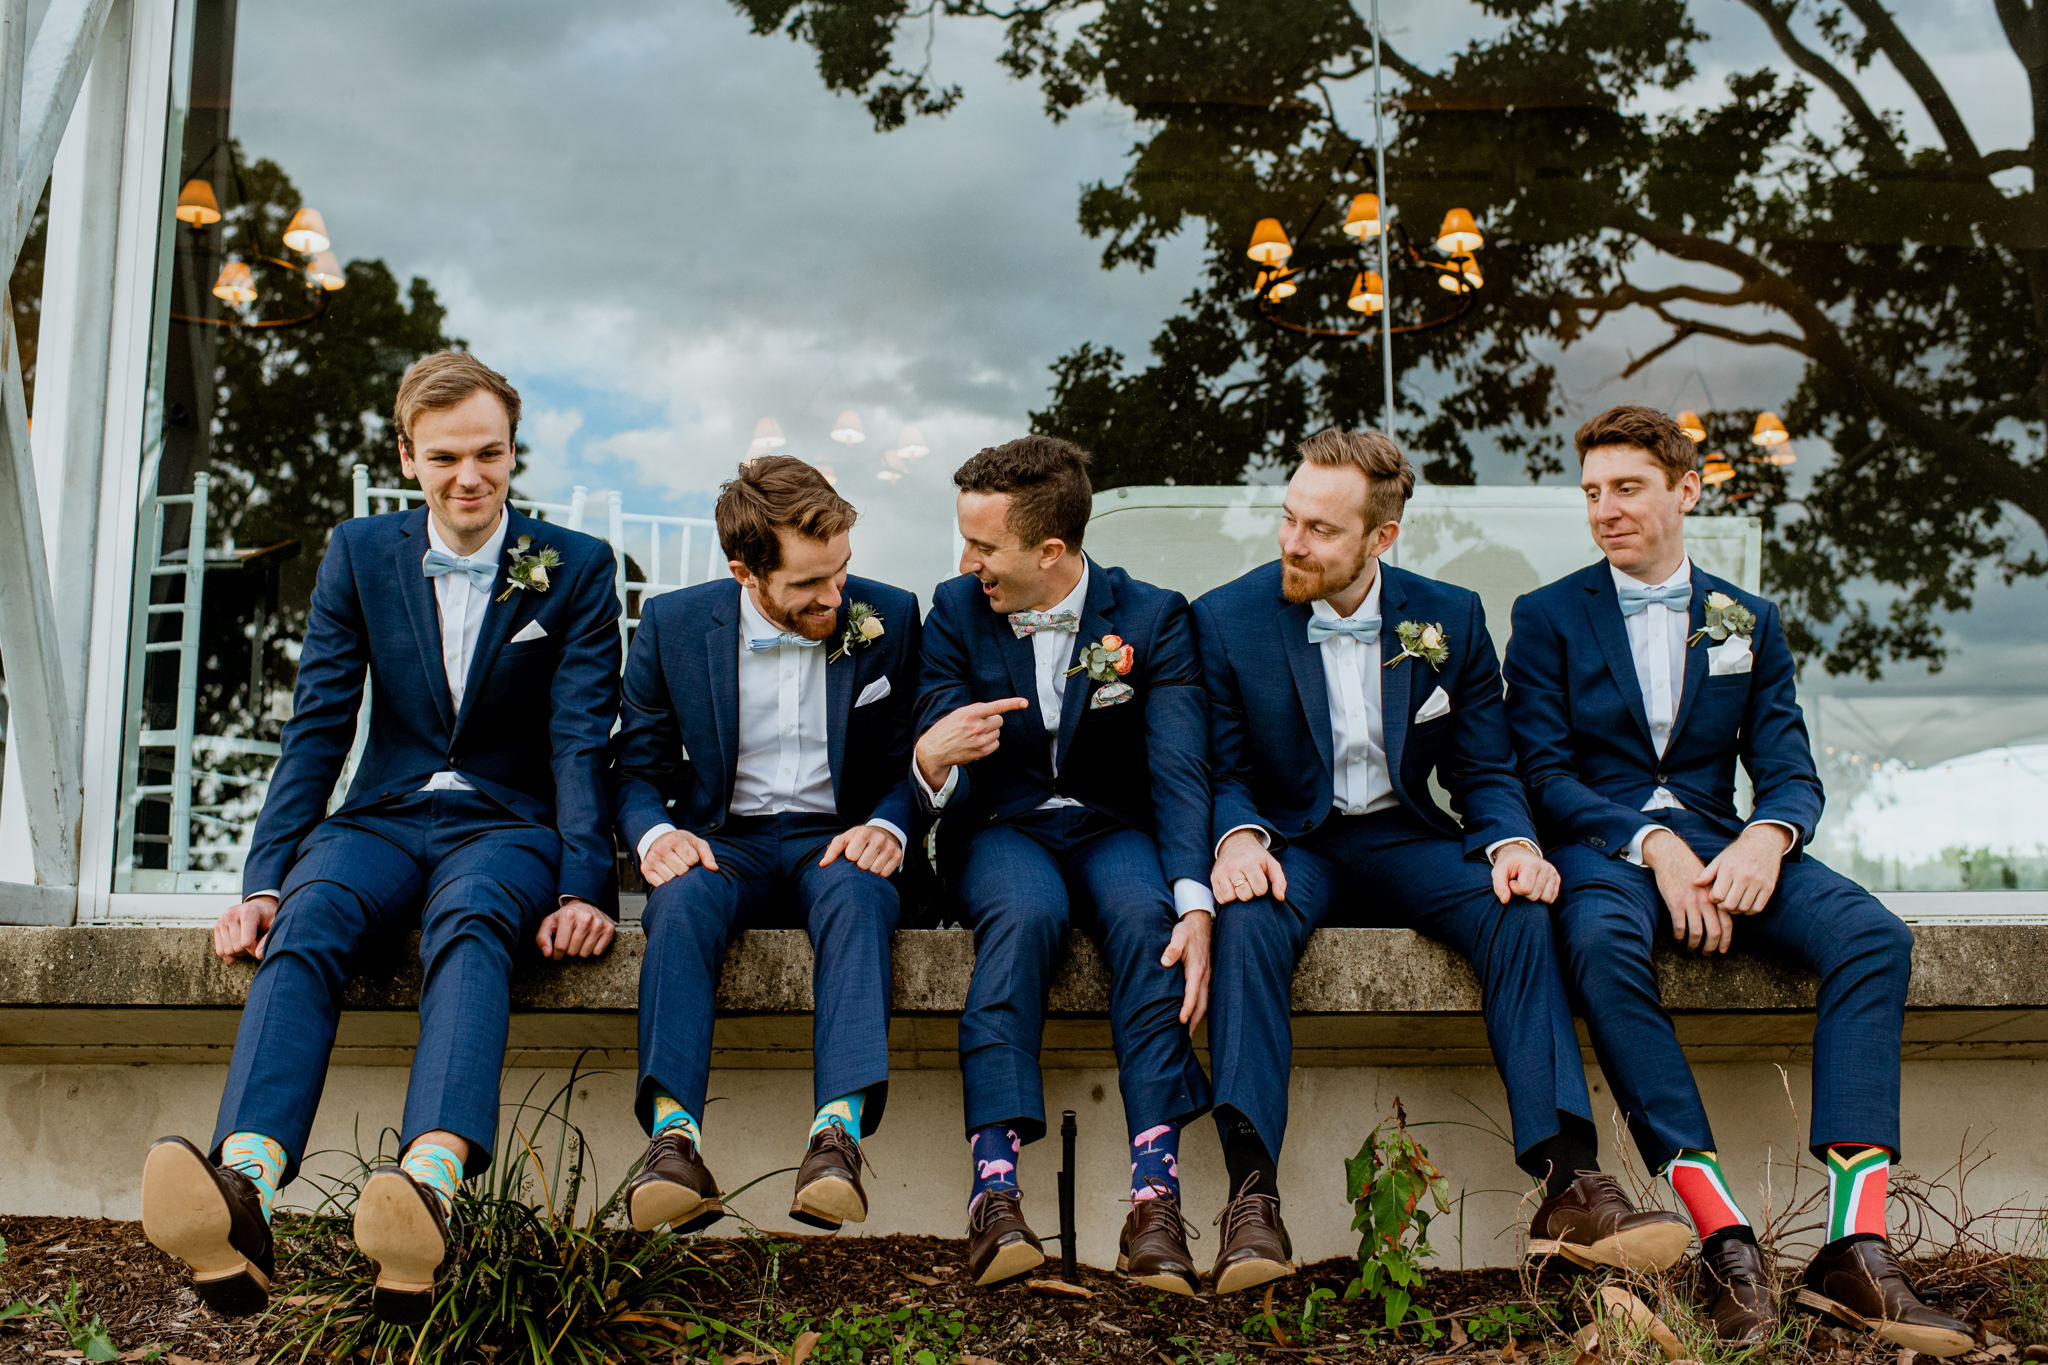 Groomsmen with groom sitting in a row showing their socks